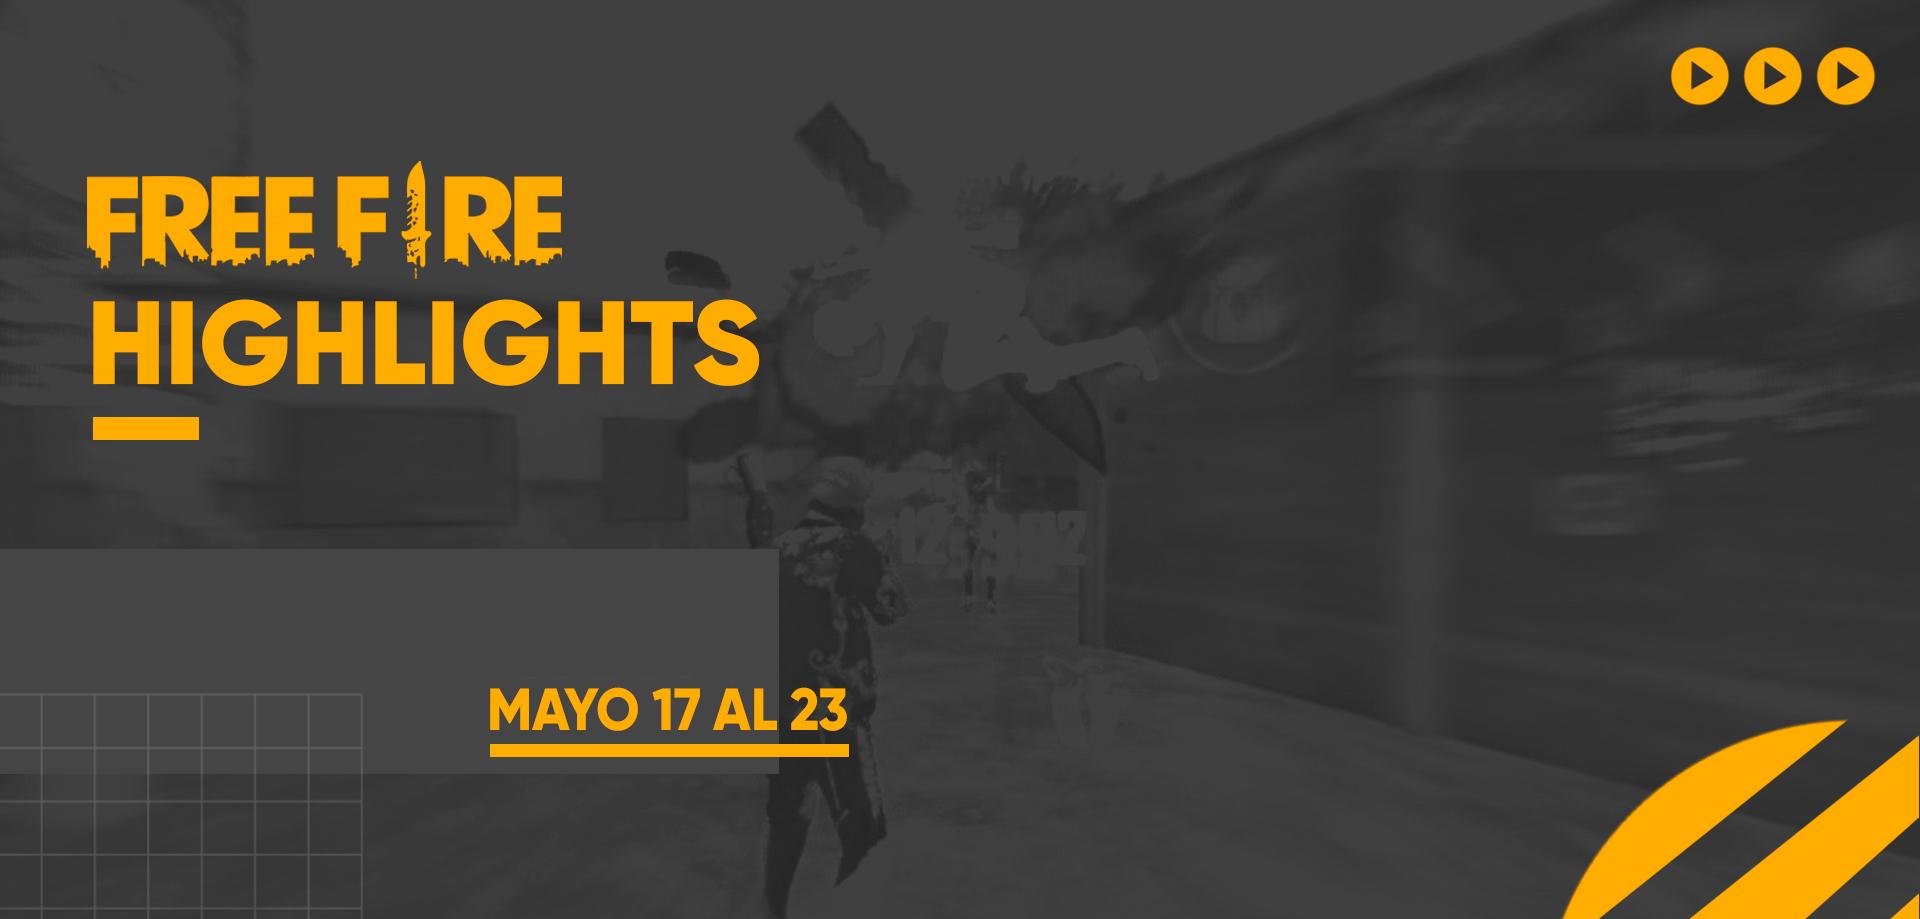 Free Fire | Highlights - 17 al 23 de Mayo.